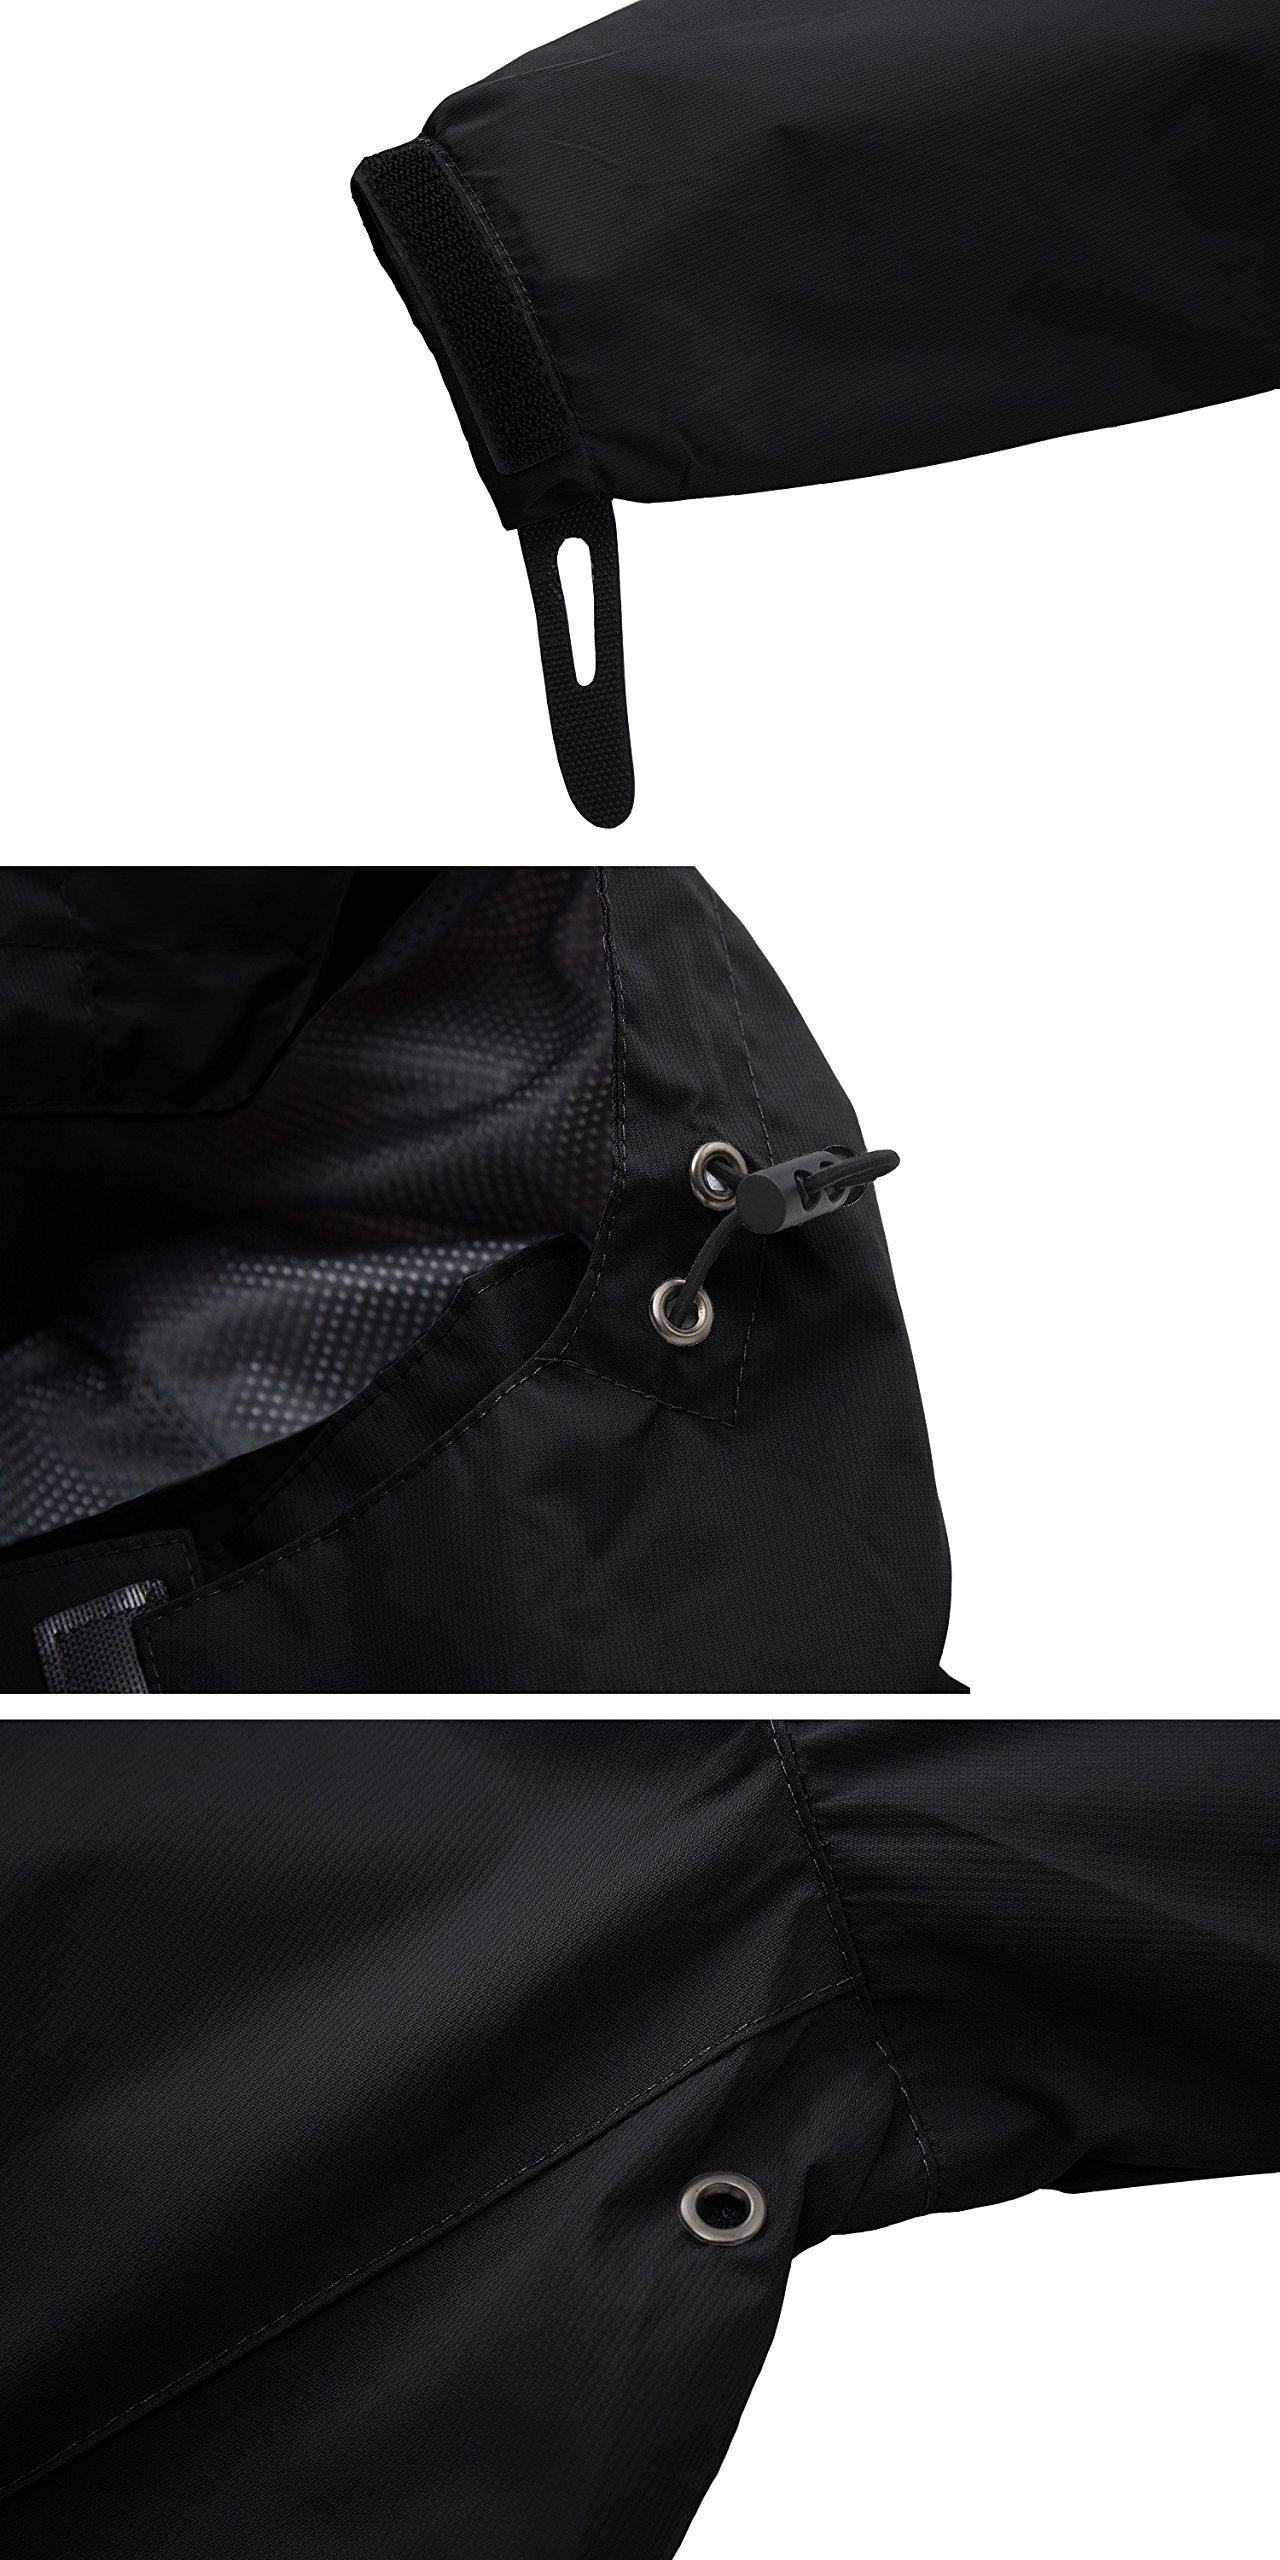 2eca0ffa30ca Wantdo Men s Mountain Windproof Rain Jacket Breathable Hooded ...